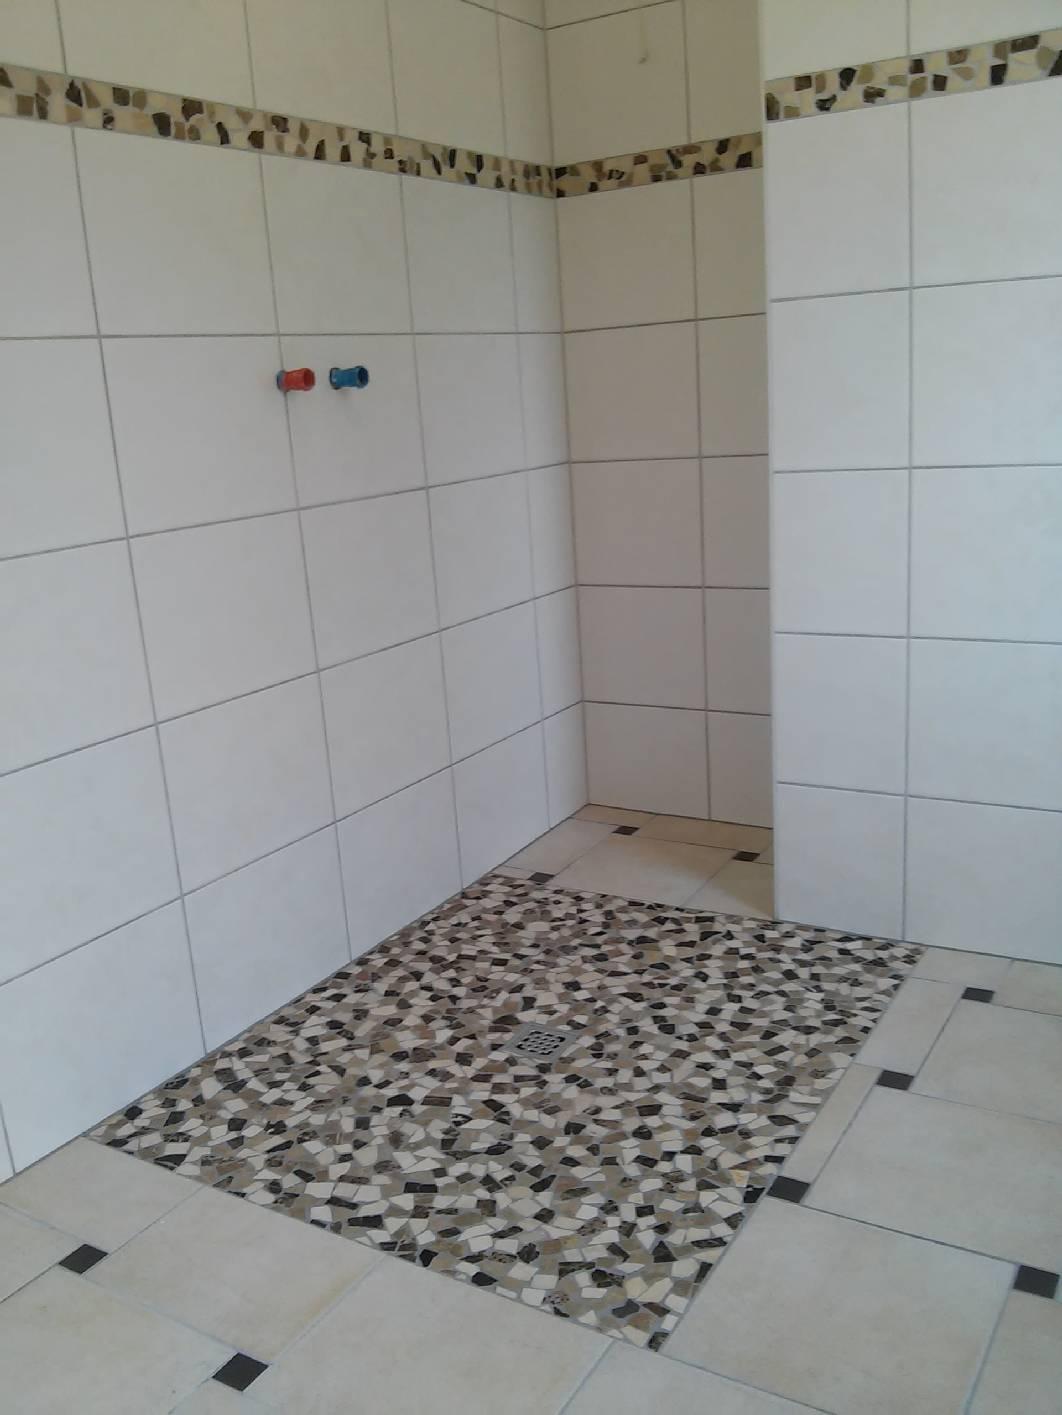 behindertengerechtes badezimmer vorschriften slagerijstok. Black Bedroom Furniture Sets. Home Design Ideas